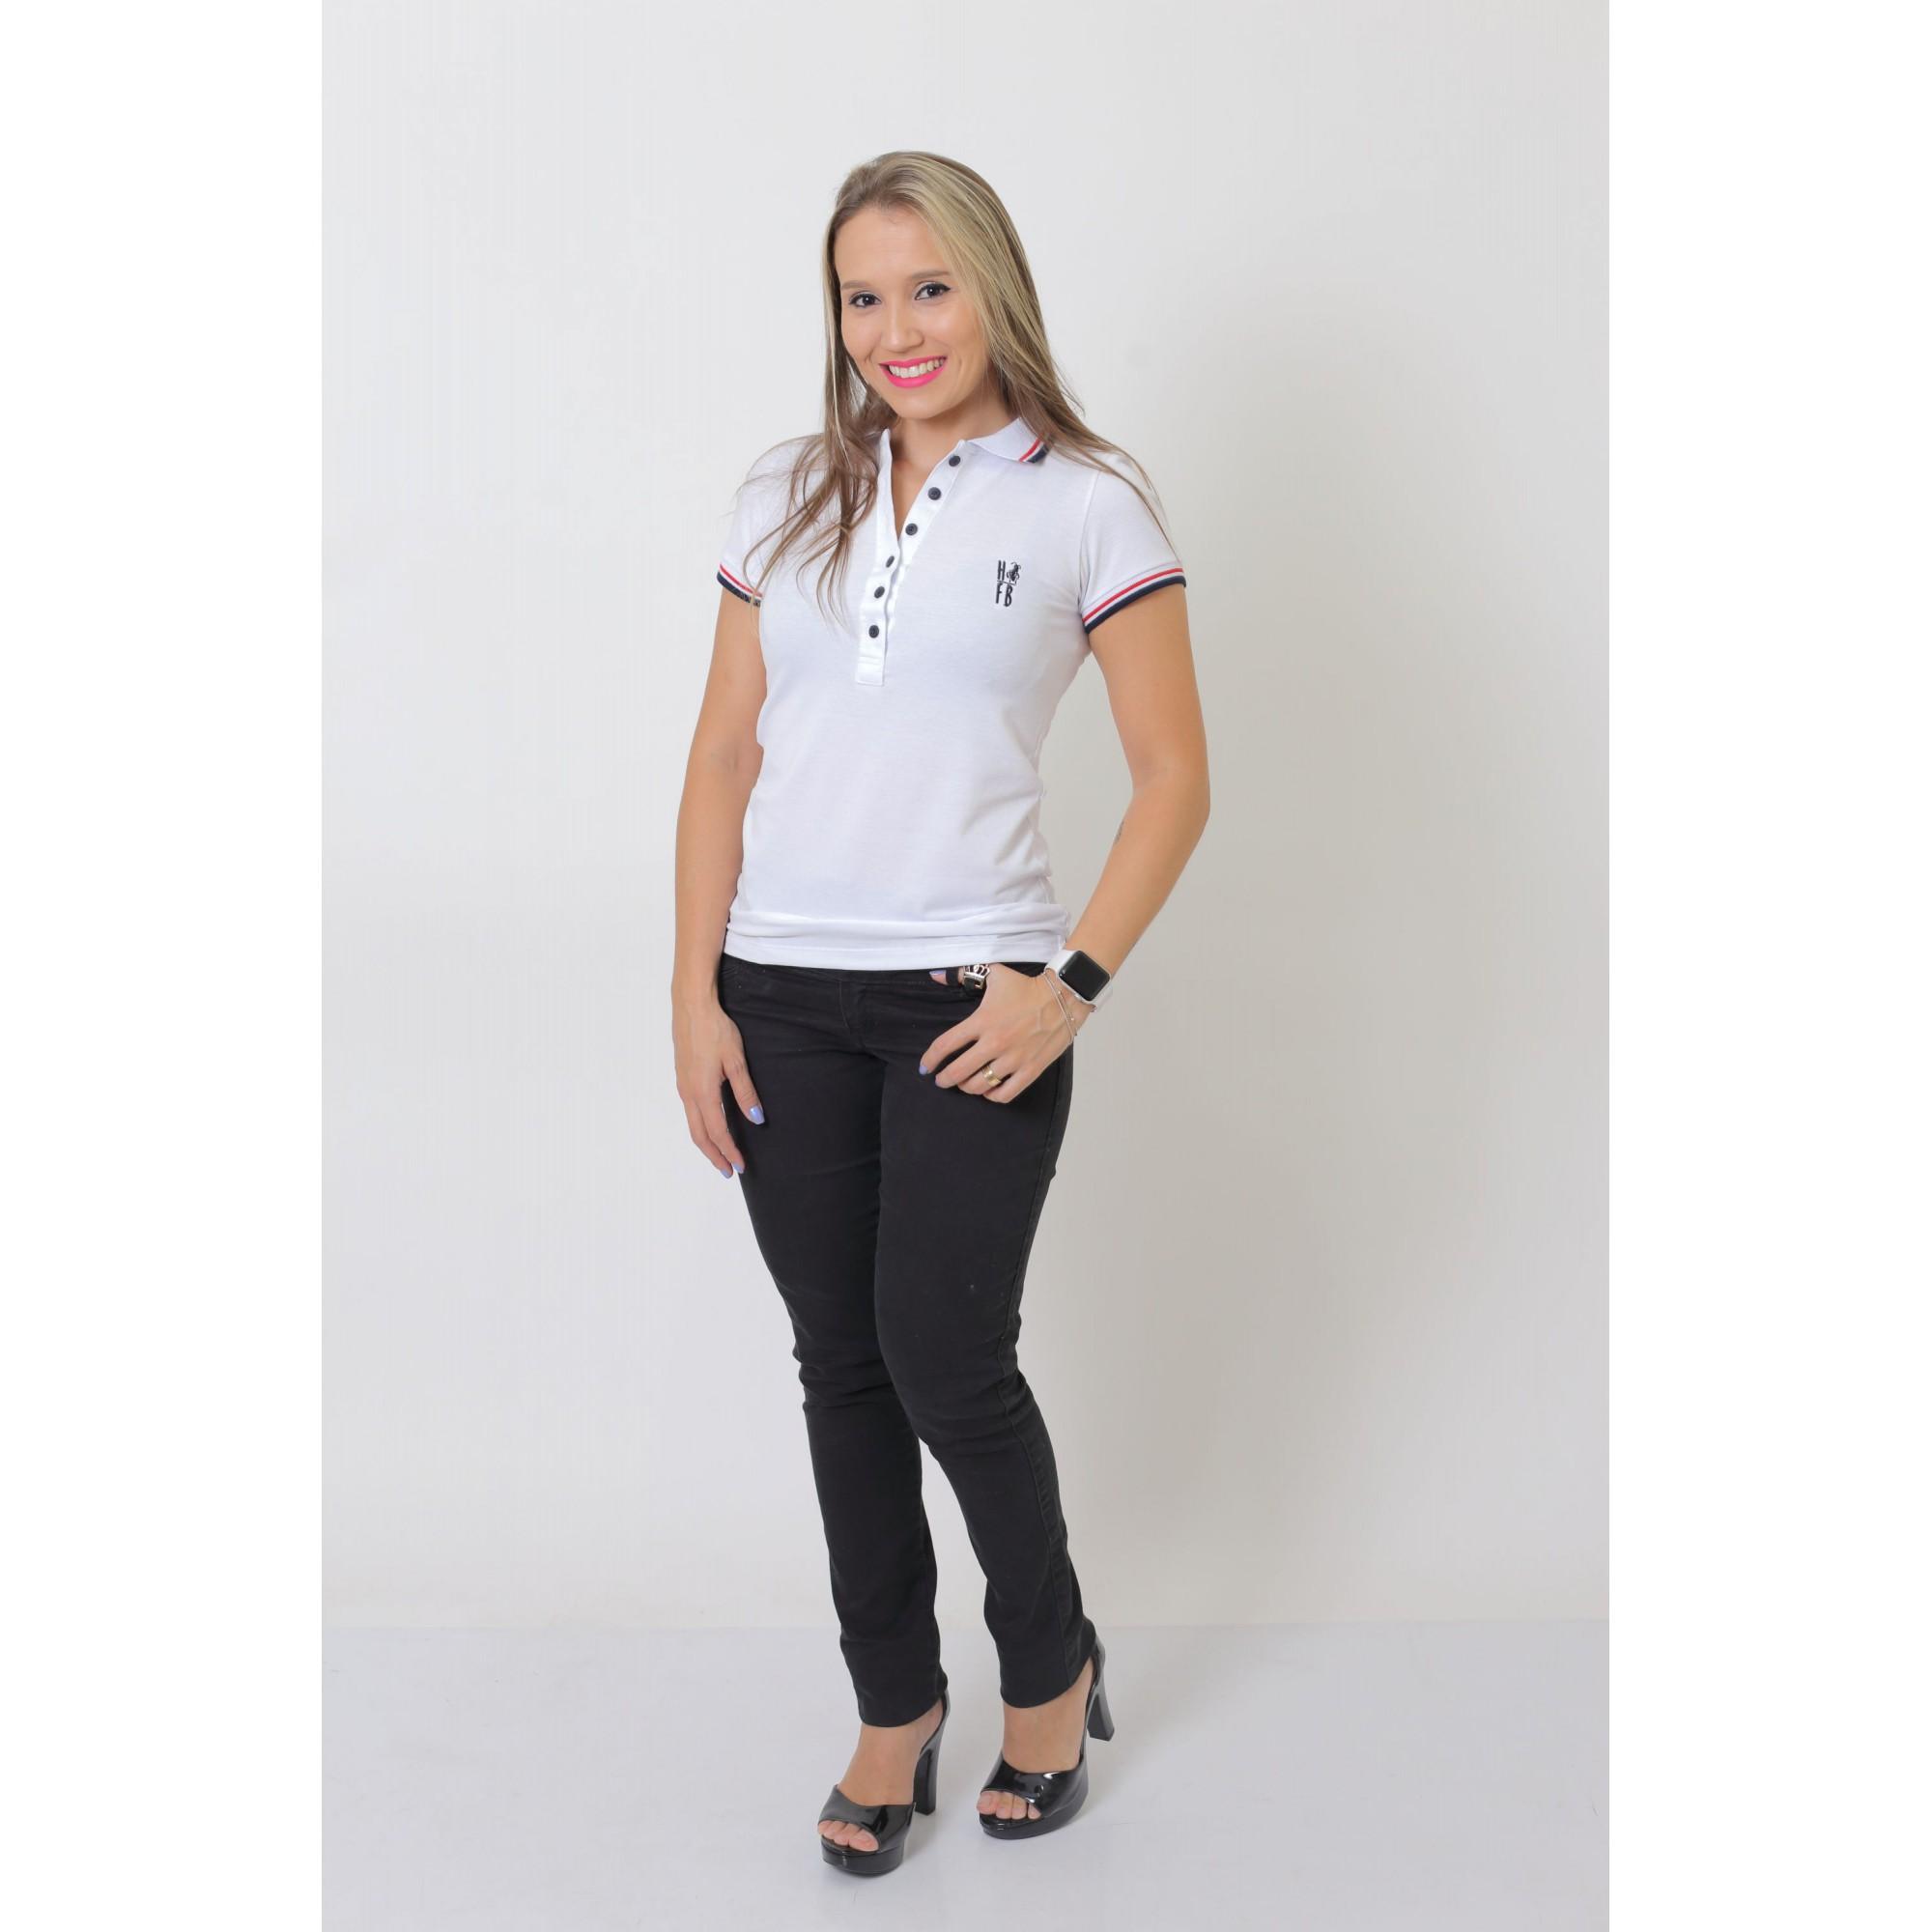 MÃE E FILHO > Kit 02 peças - Camisa + Body Unissex Polo Branca   [Coleção Tal Mãe Tal Filho]  - Heitor Fashion Brazil